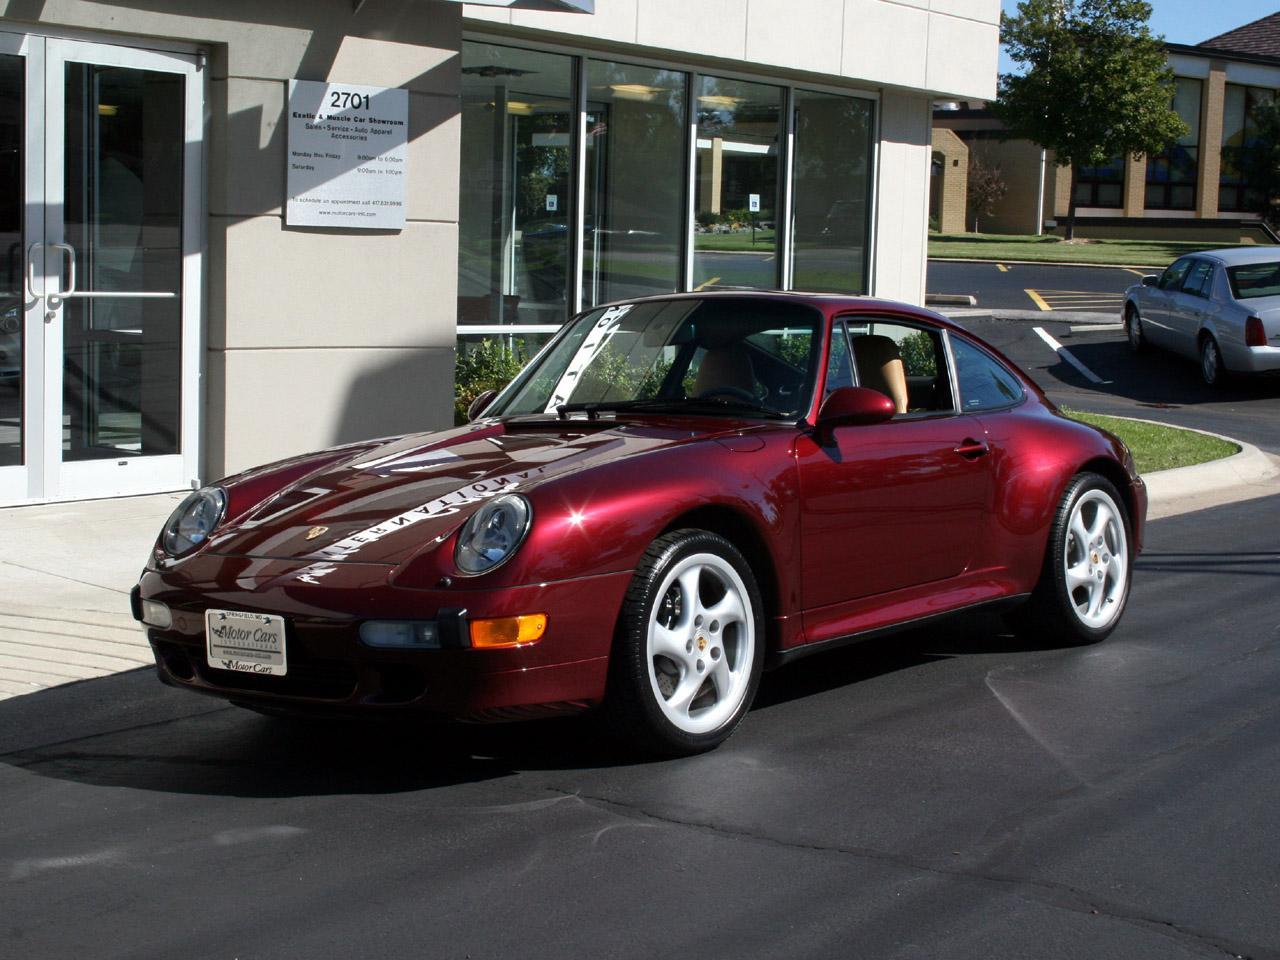 1998 porsche 993 911 carrera s. Black Bedroom Furniture Sets. Home Design Ideas